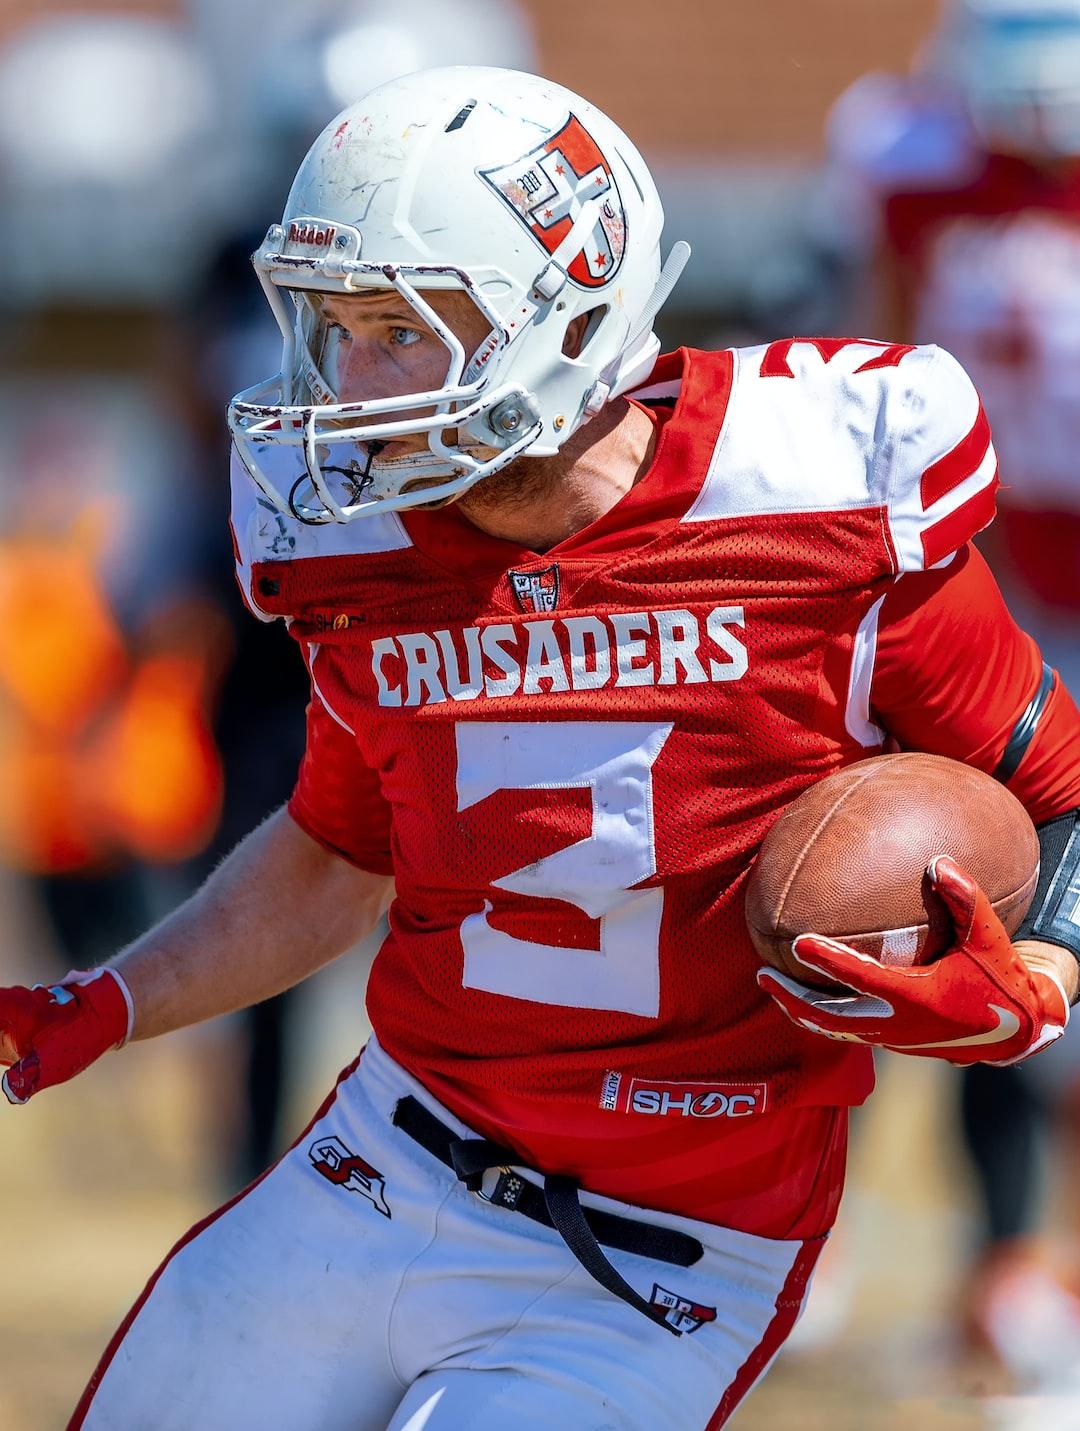 Gridiron Victoria: Western Crusaders offensive player Tyson Garnham looking for a way through the defense.